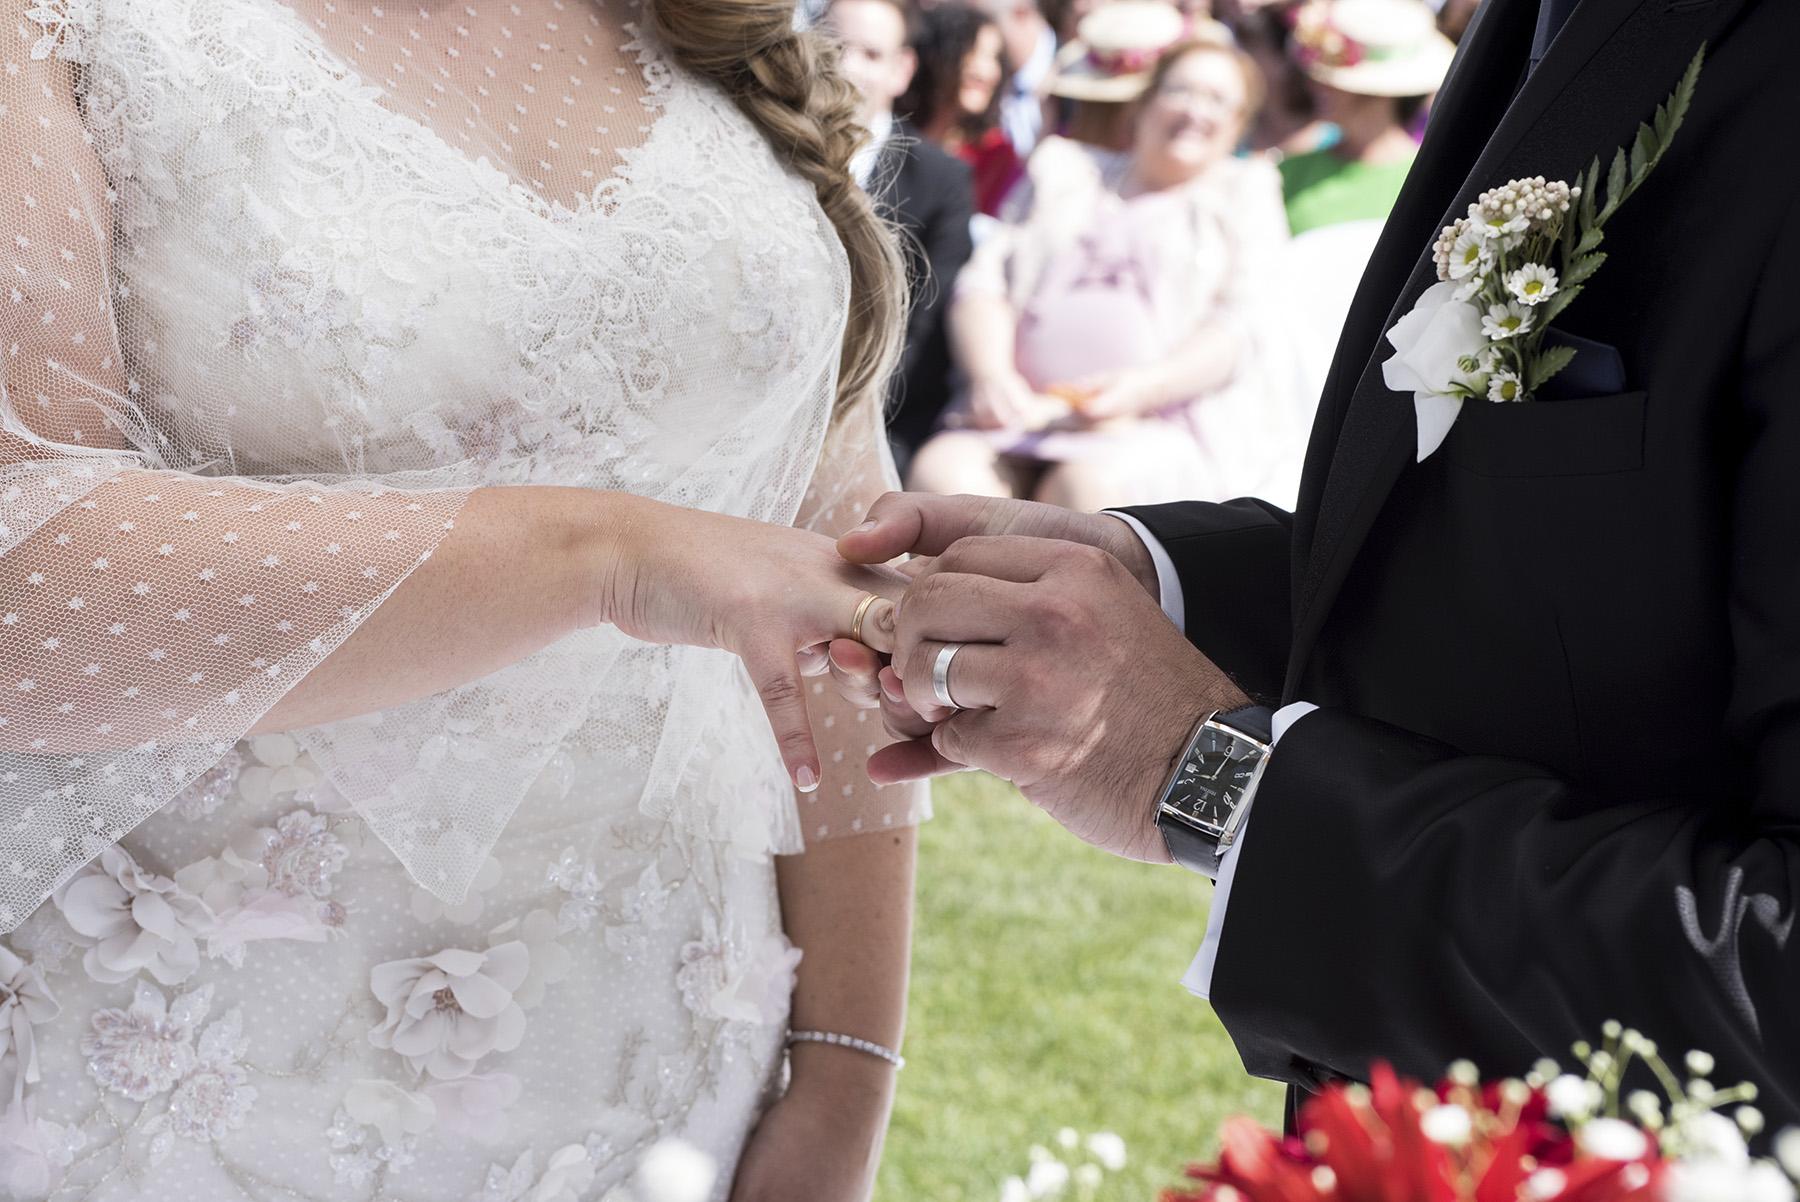 Fotografos Badajoz, Fotografia de bodas en Badajoz, fotografia profesional de bodas